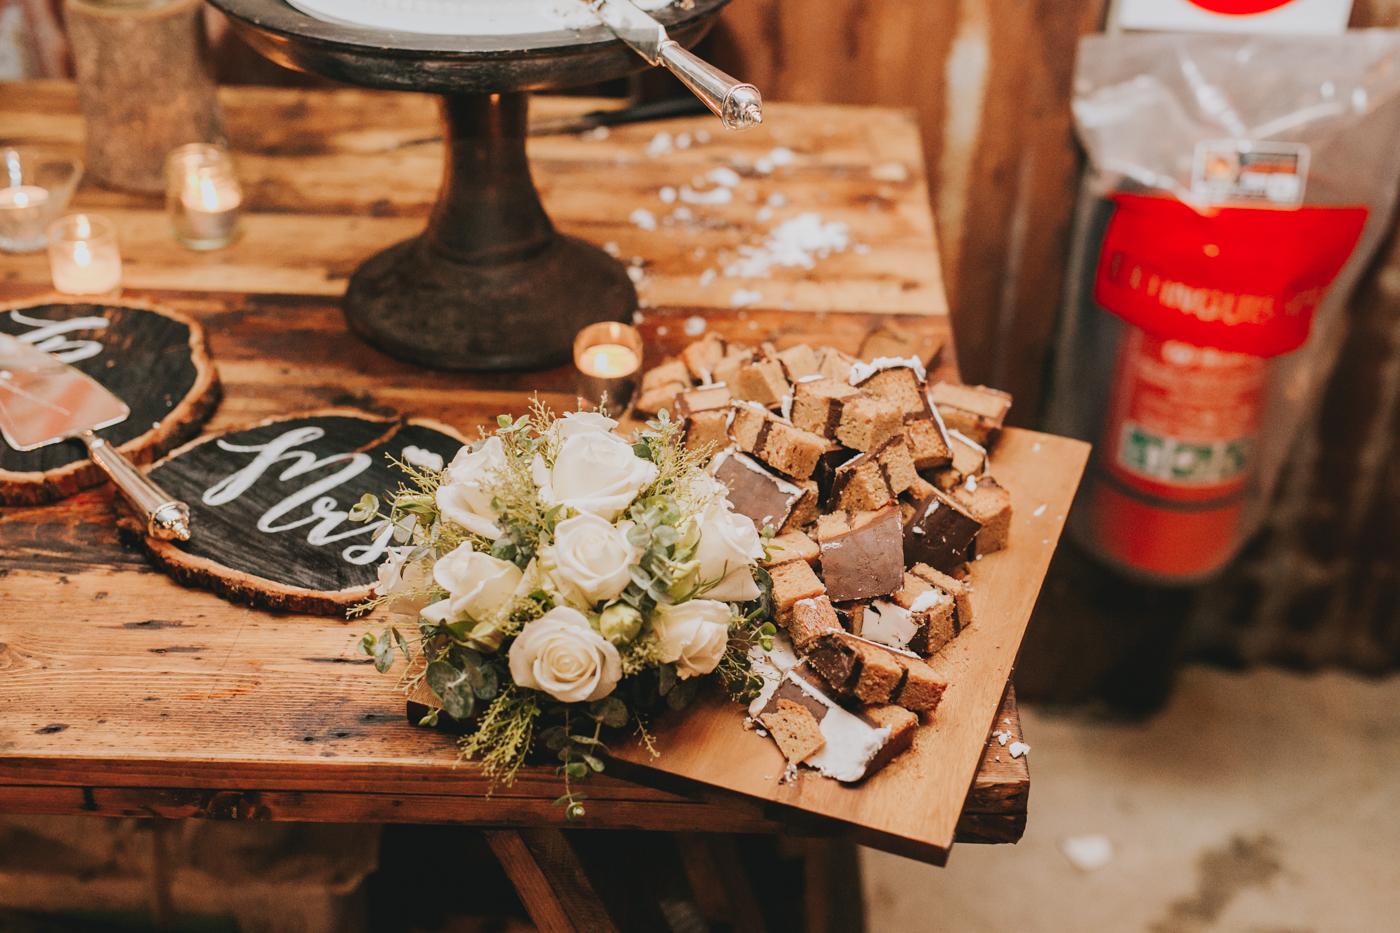 Rachel & Jacob - Willow Farm Berry - South Coast Wedding - Samantha Heather Photography-212.jpg